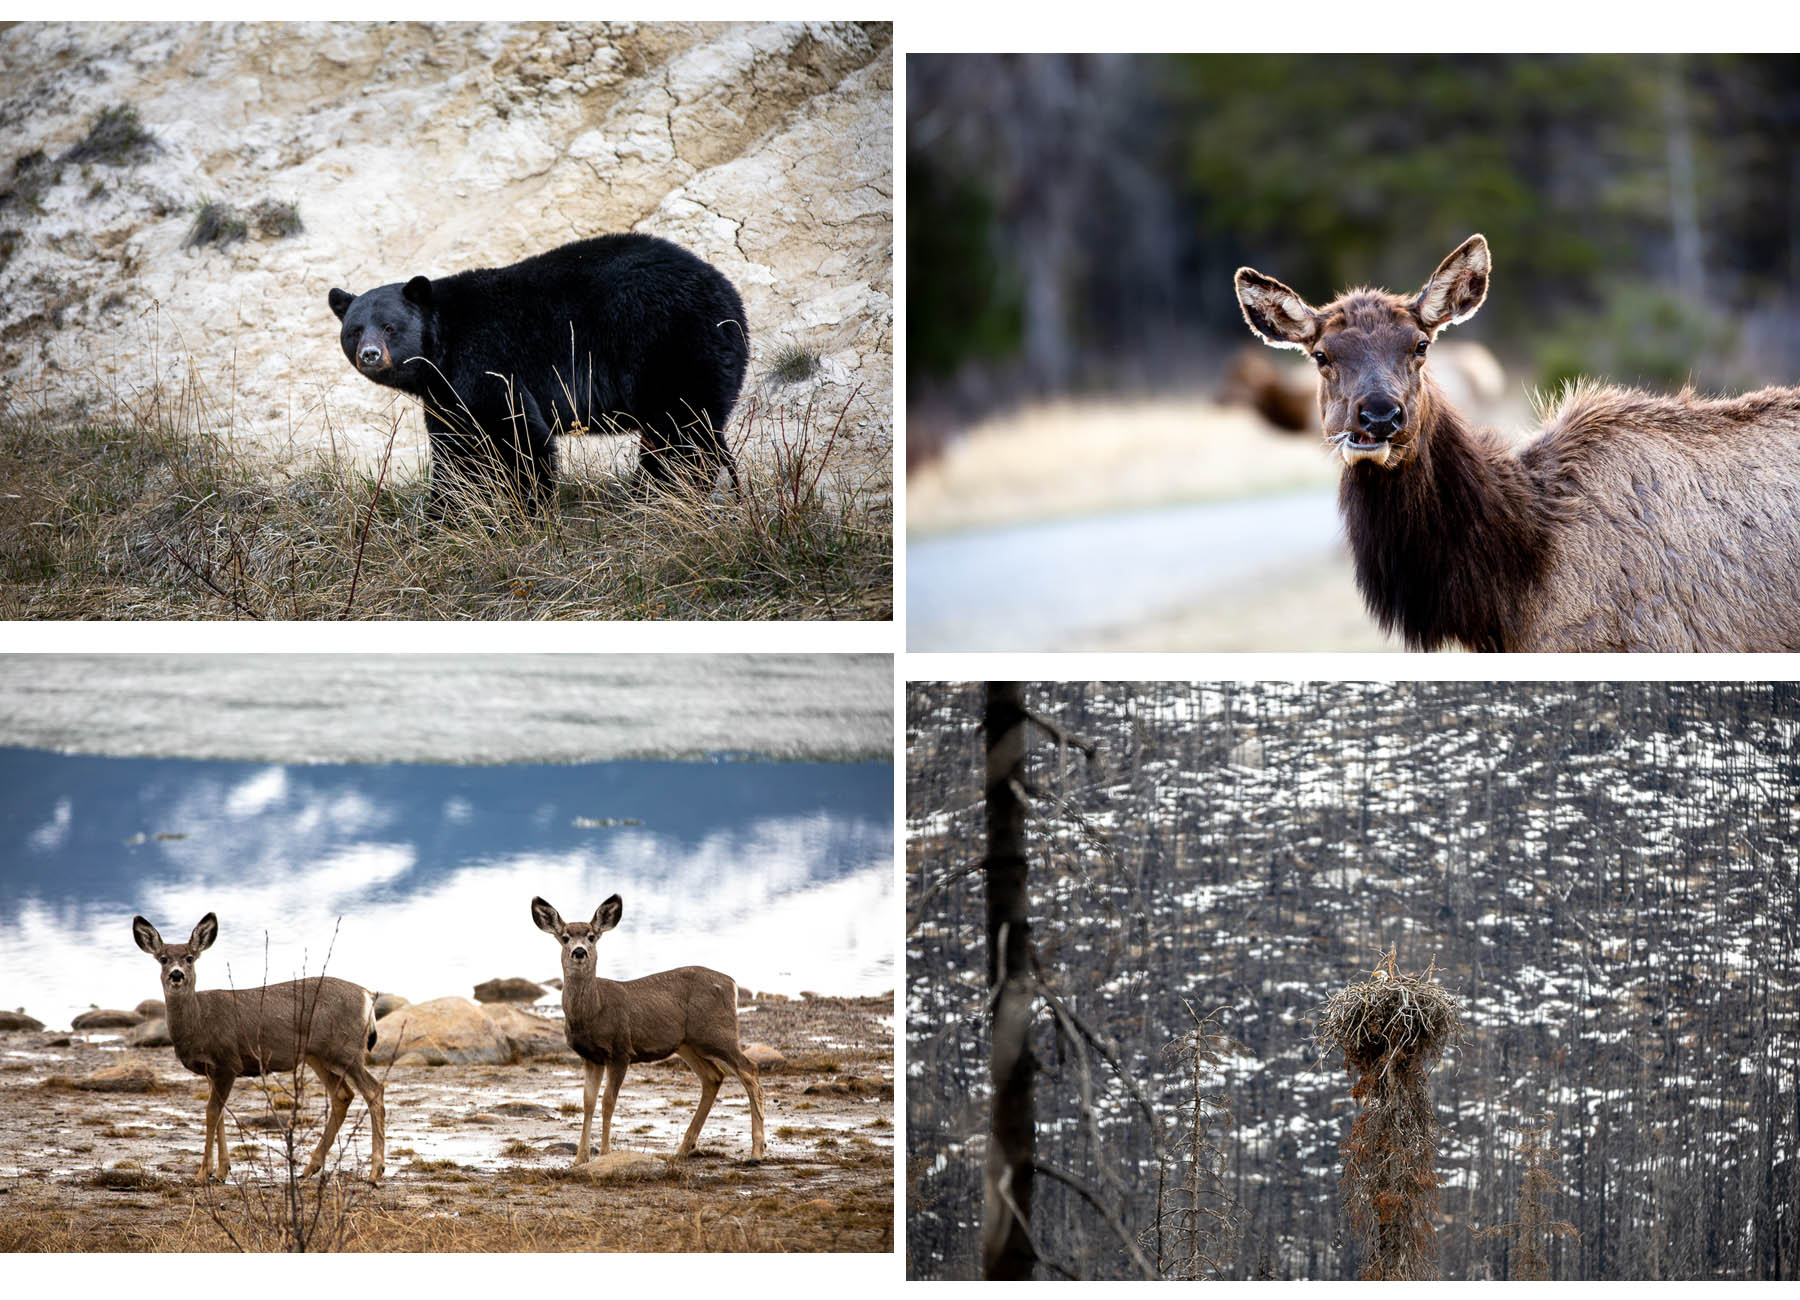 Bild: Wildnis Tierarten Tierbeobachtungen Jasper Nationalpark Kanada Rocky Mountains